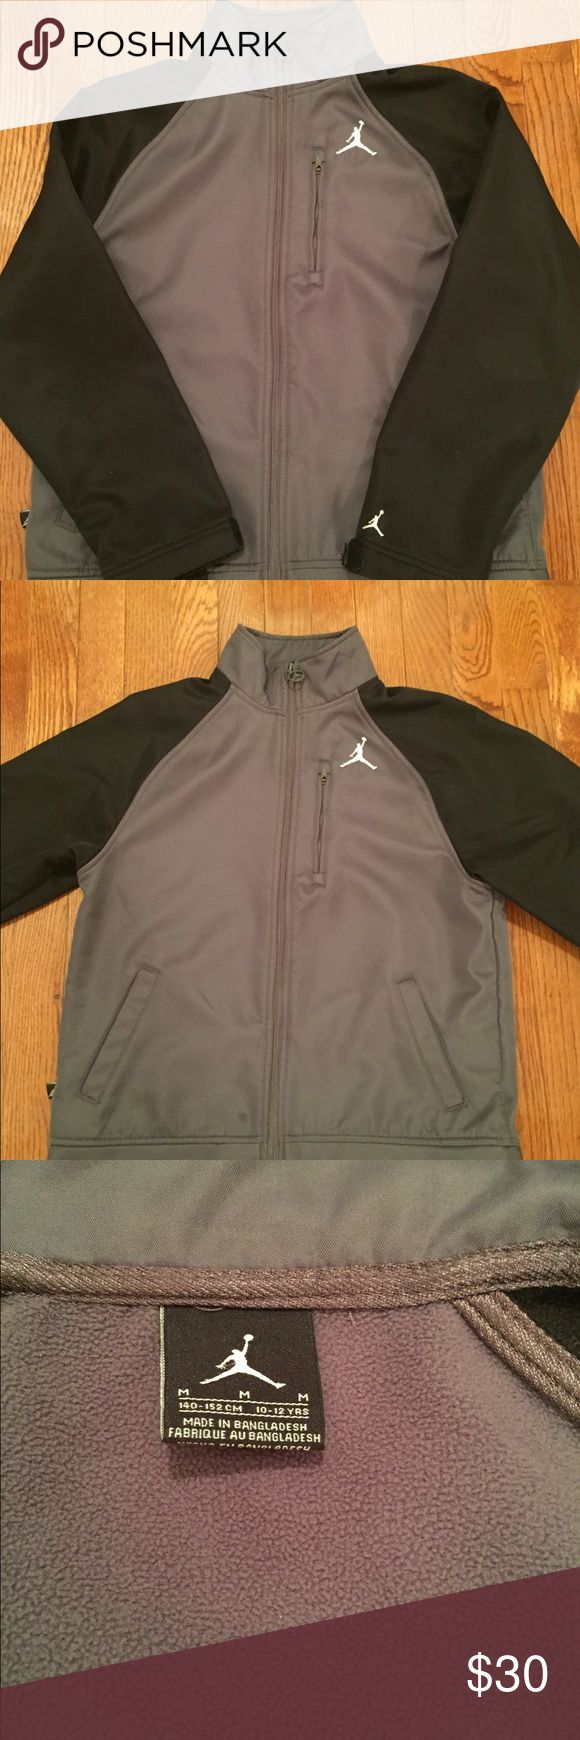 Boys Air Jordan Jacket Stylish Black and Grey Zip Front Air Jordan Jacket Nice With jeans joggers sweatpants or track pants Air Jordan Jackets & Coats